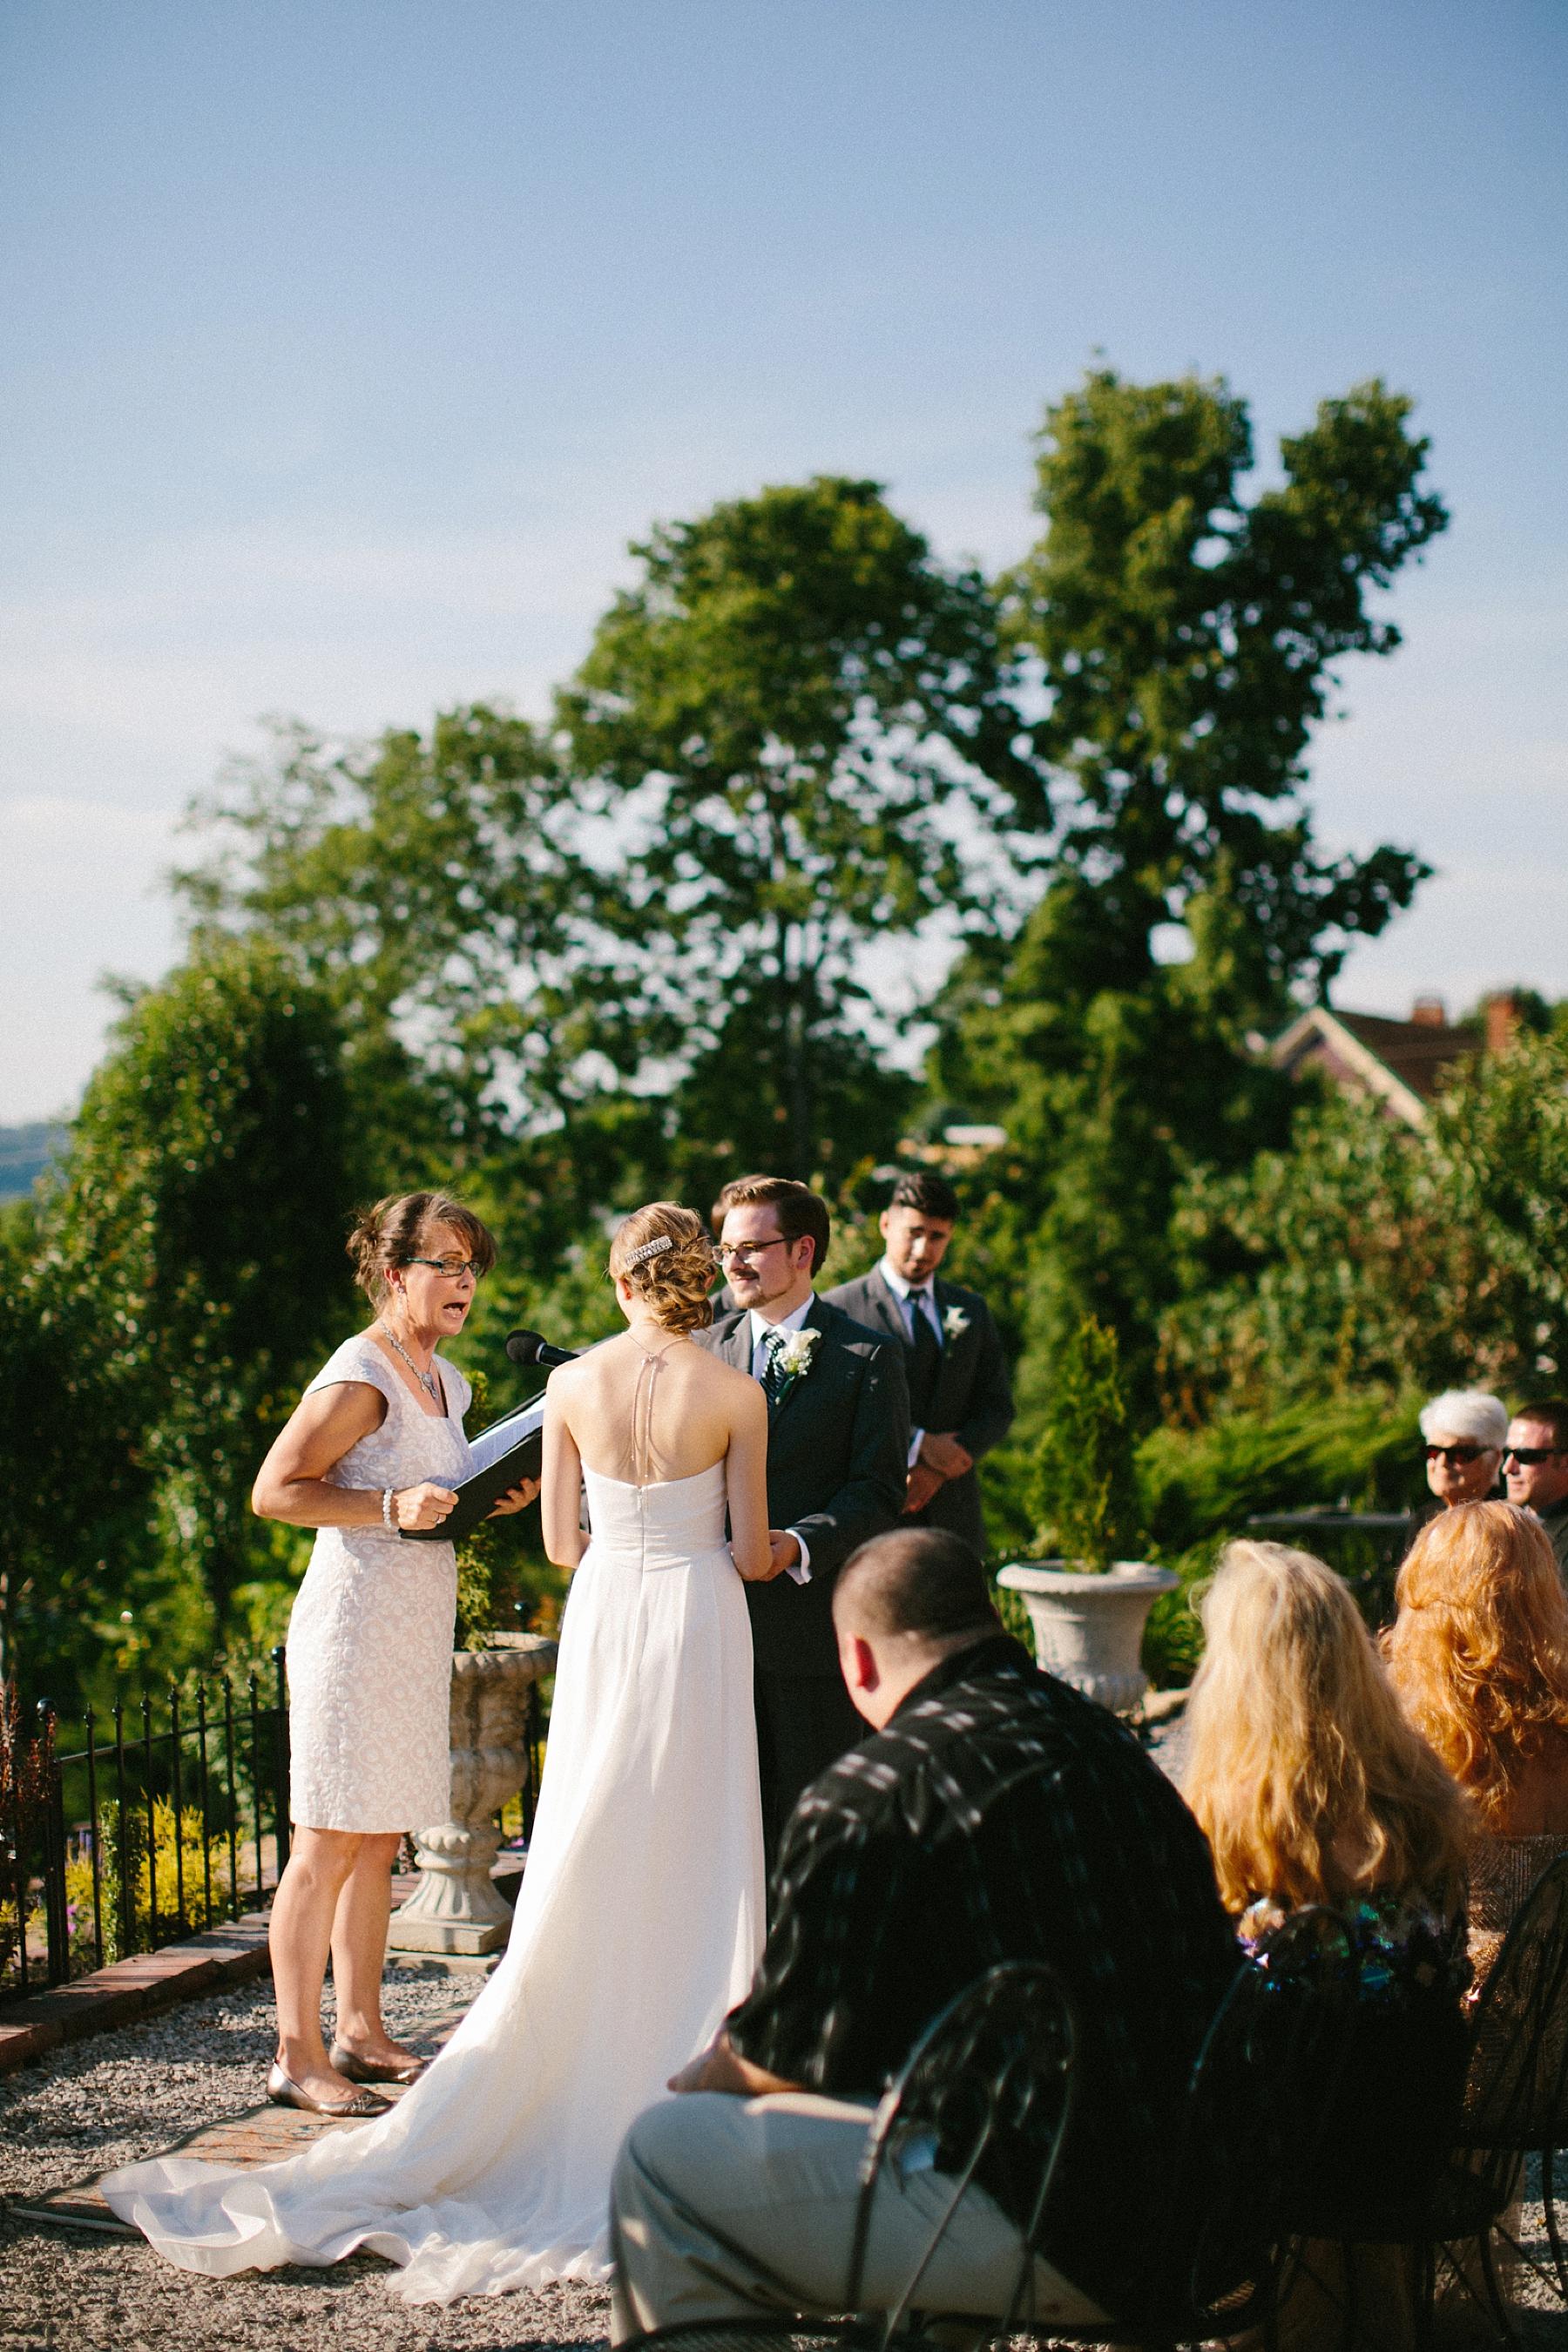 farm-wedding-engagement-session-destination-intimate_0069.jpg